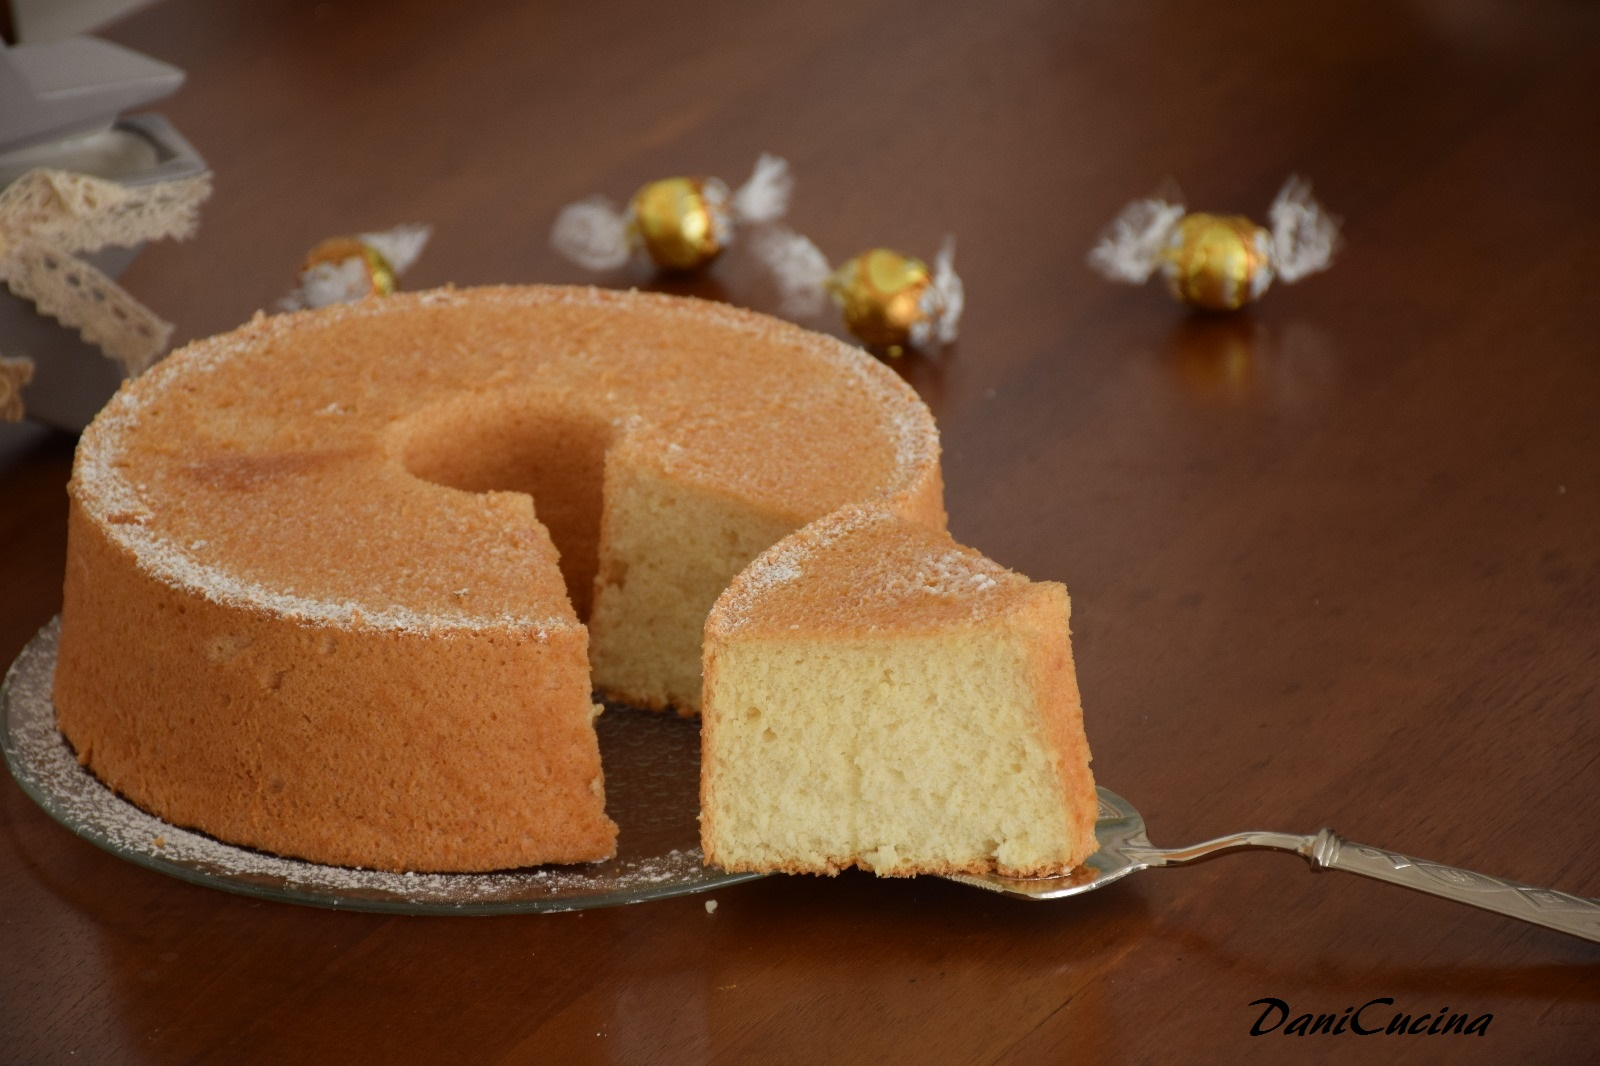 Angel Cake - La torta degli Angeli americana